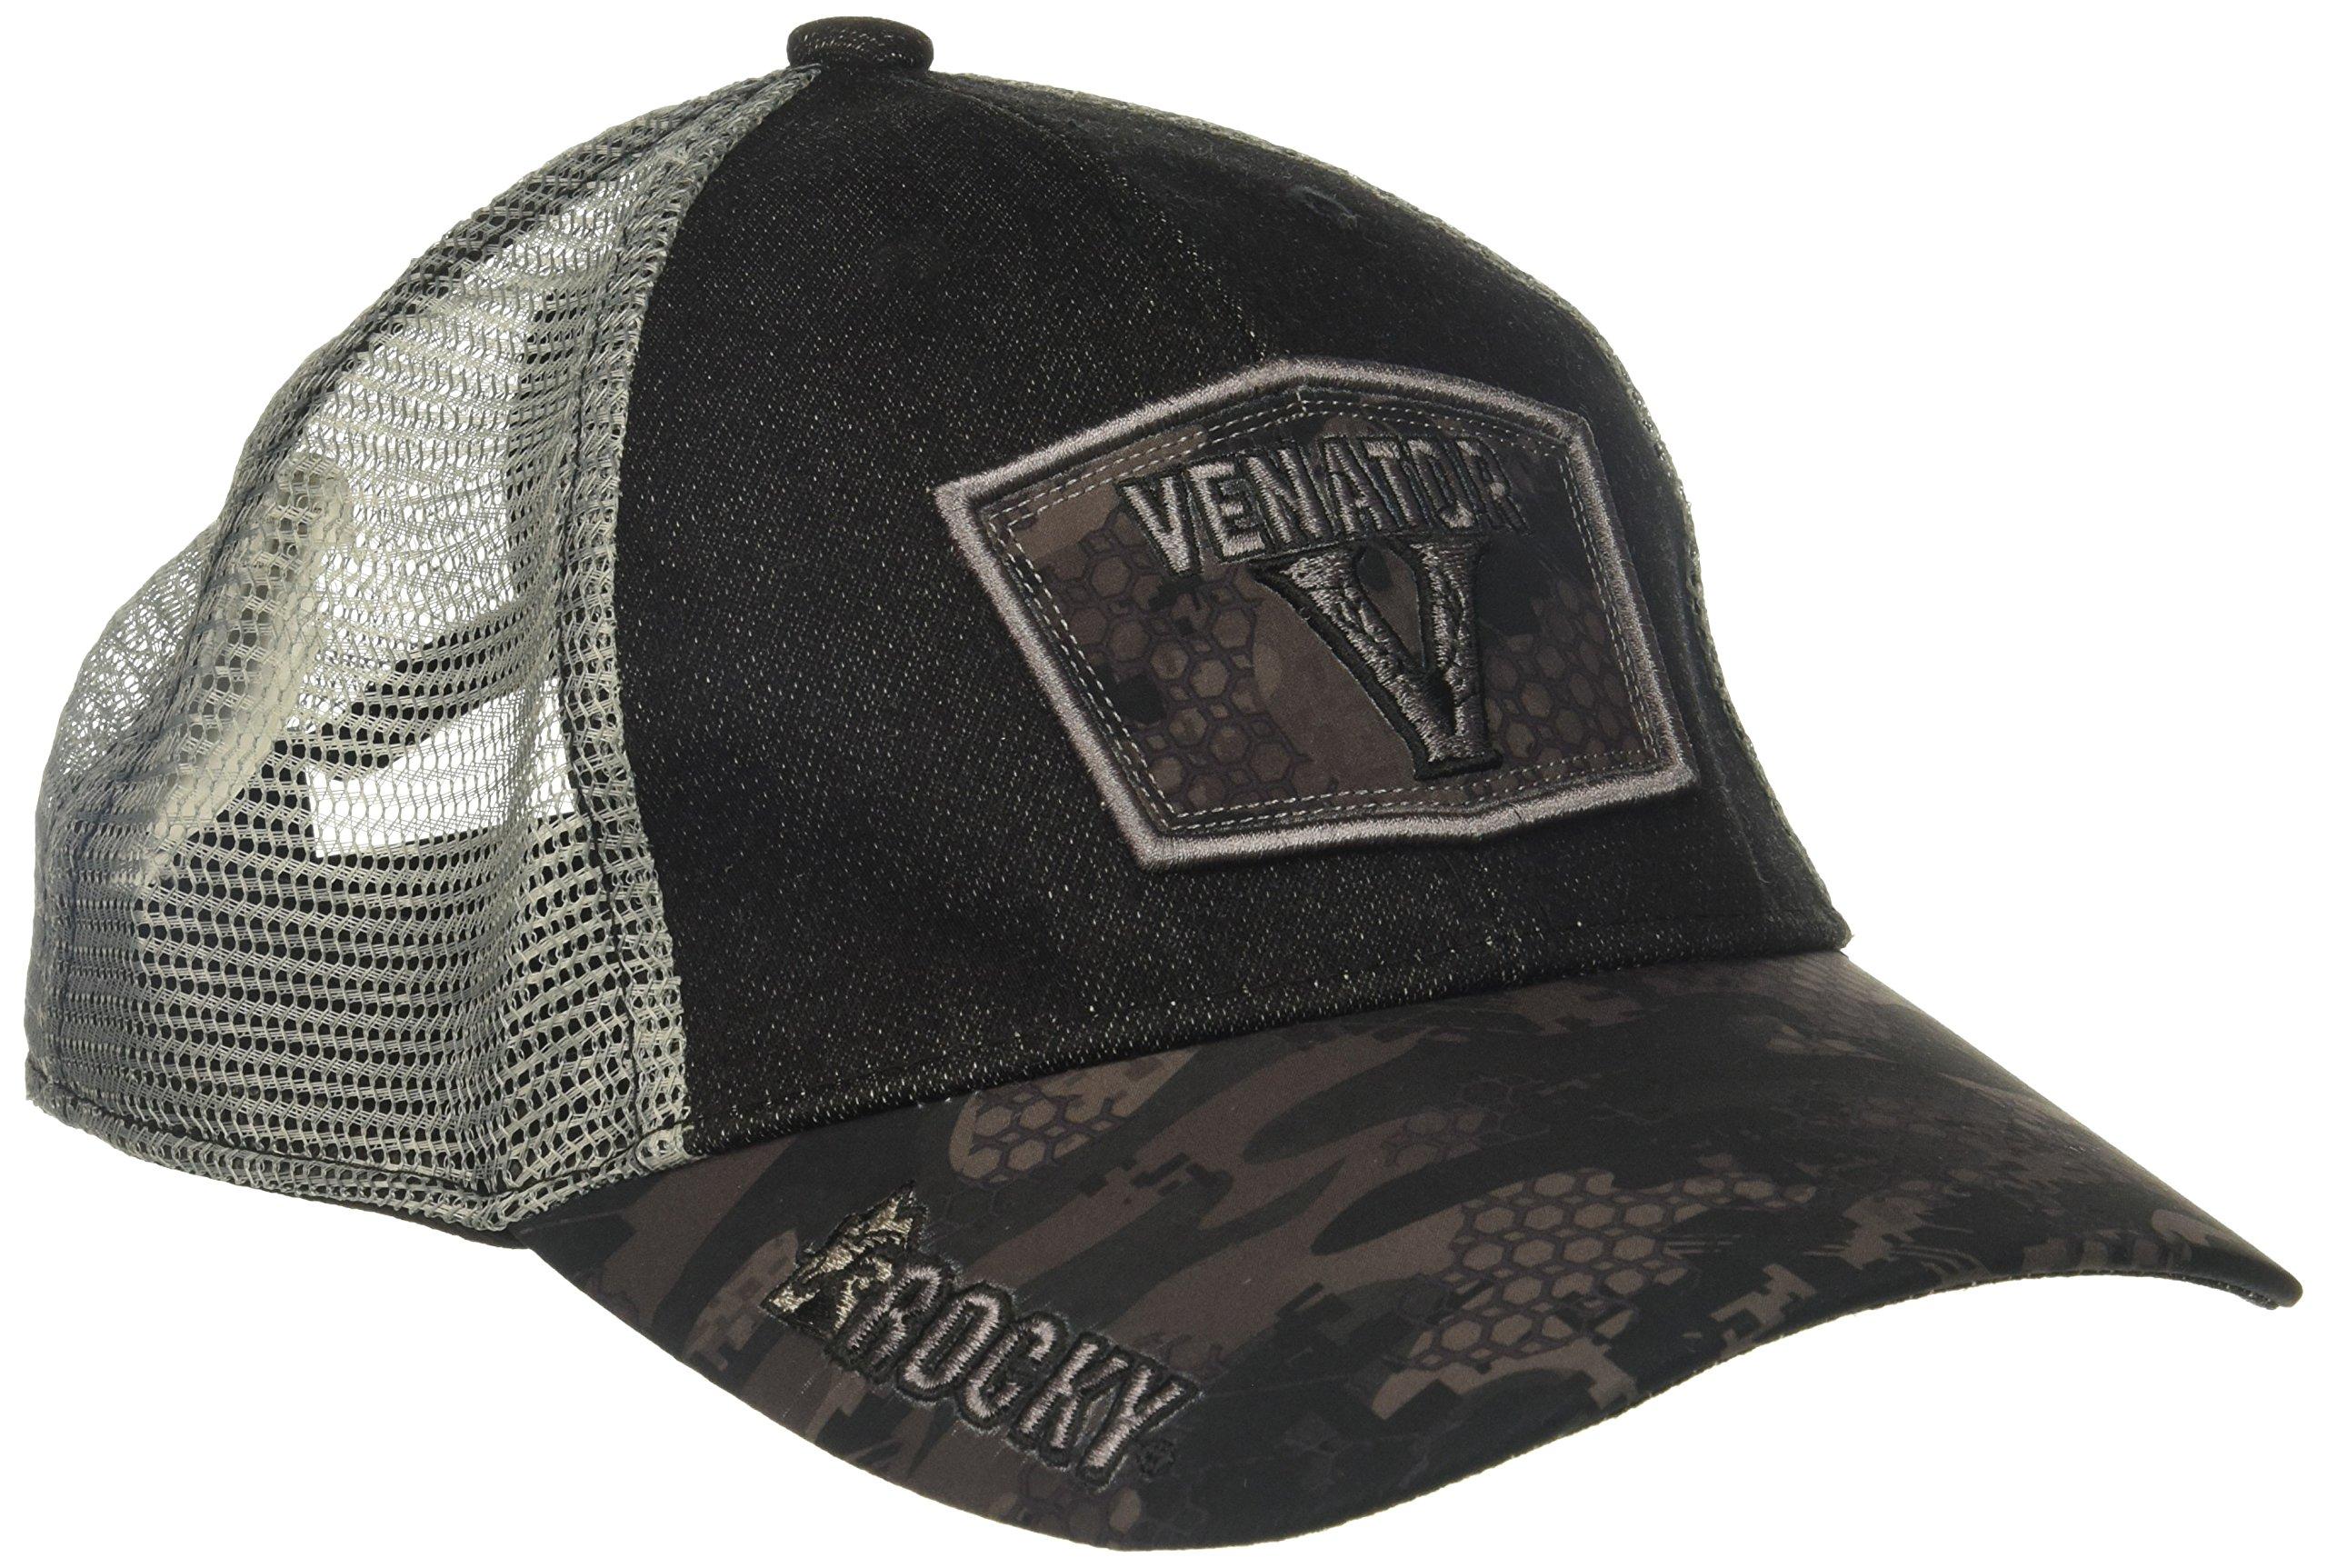 Rocky Men's Stratum Venator Logo Camo Hat, Black/Grey Camouflage, One Size